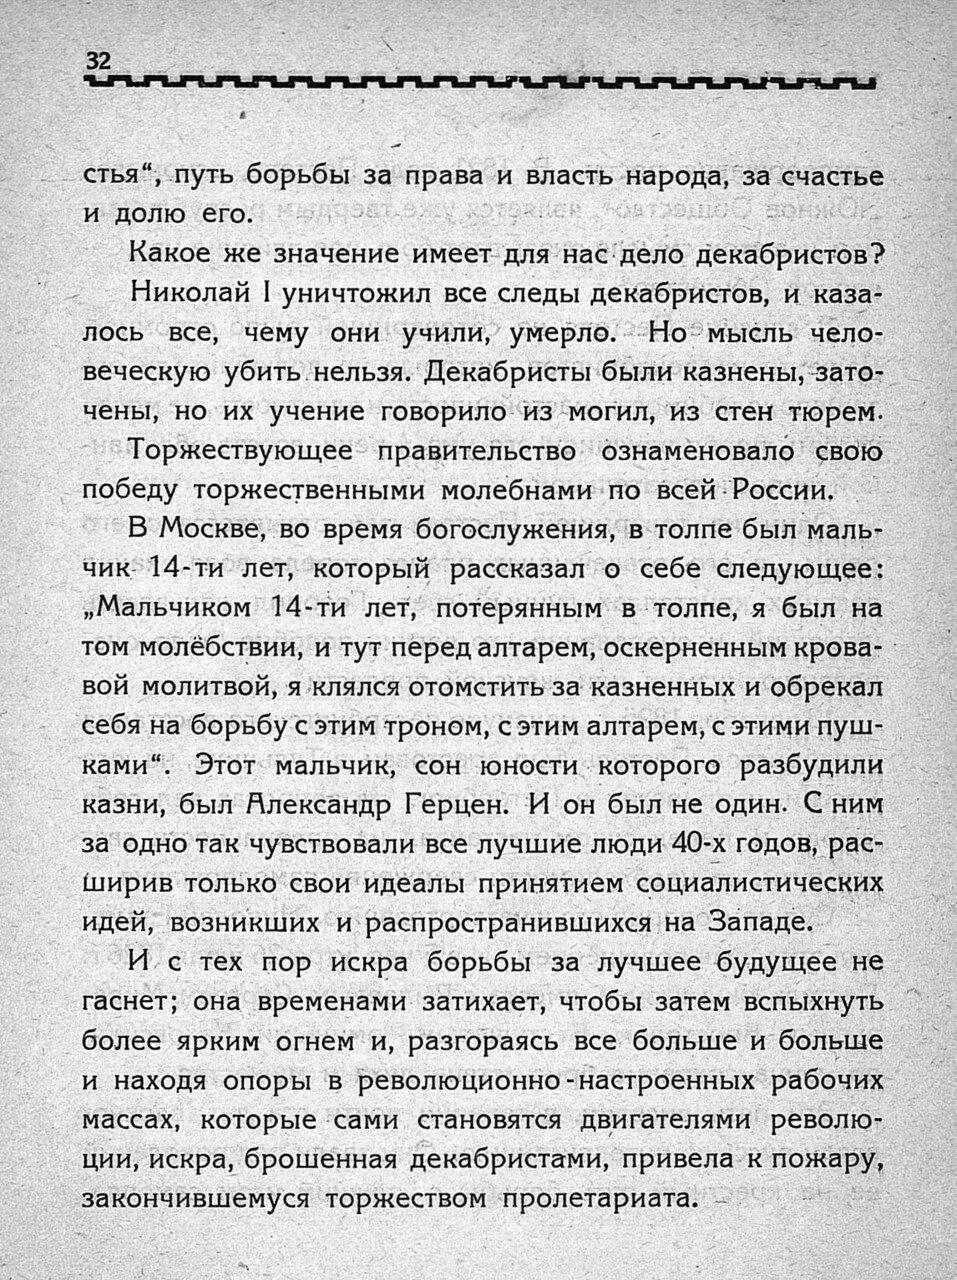 https://img-fotki.yandex.ru/get/117474/199368979.23/0_1bfae4_31c0d790_XXXL.jpg